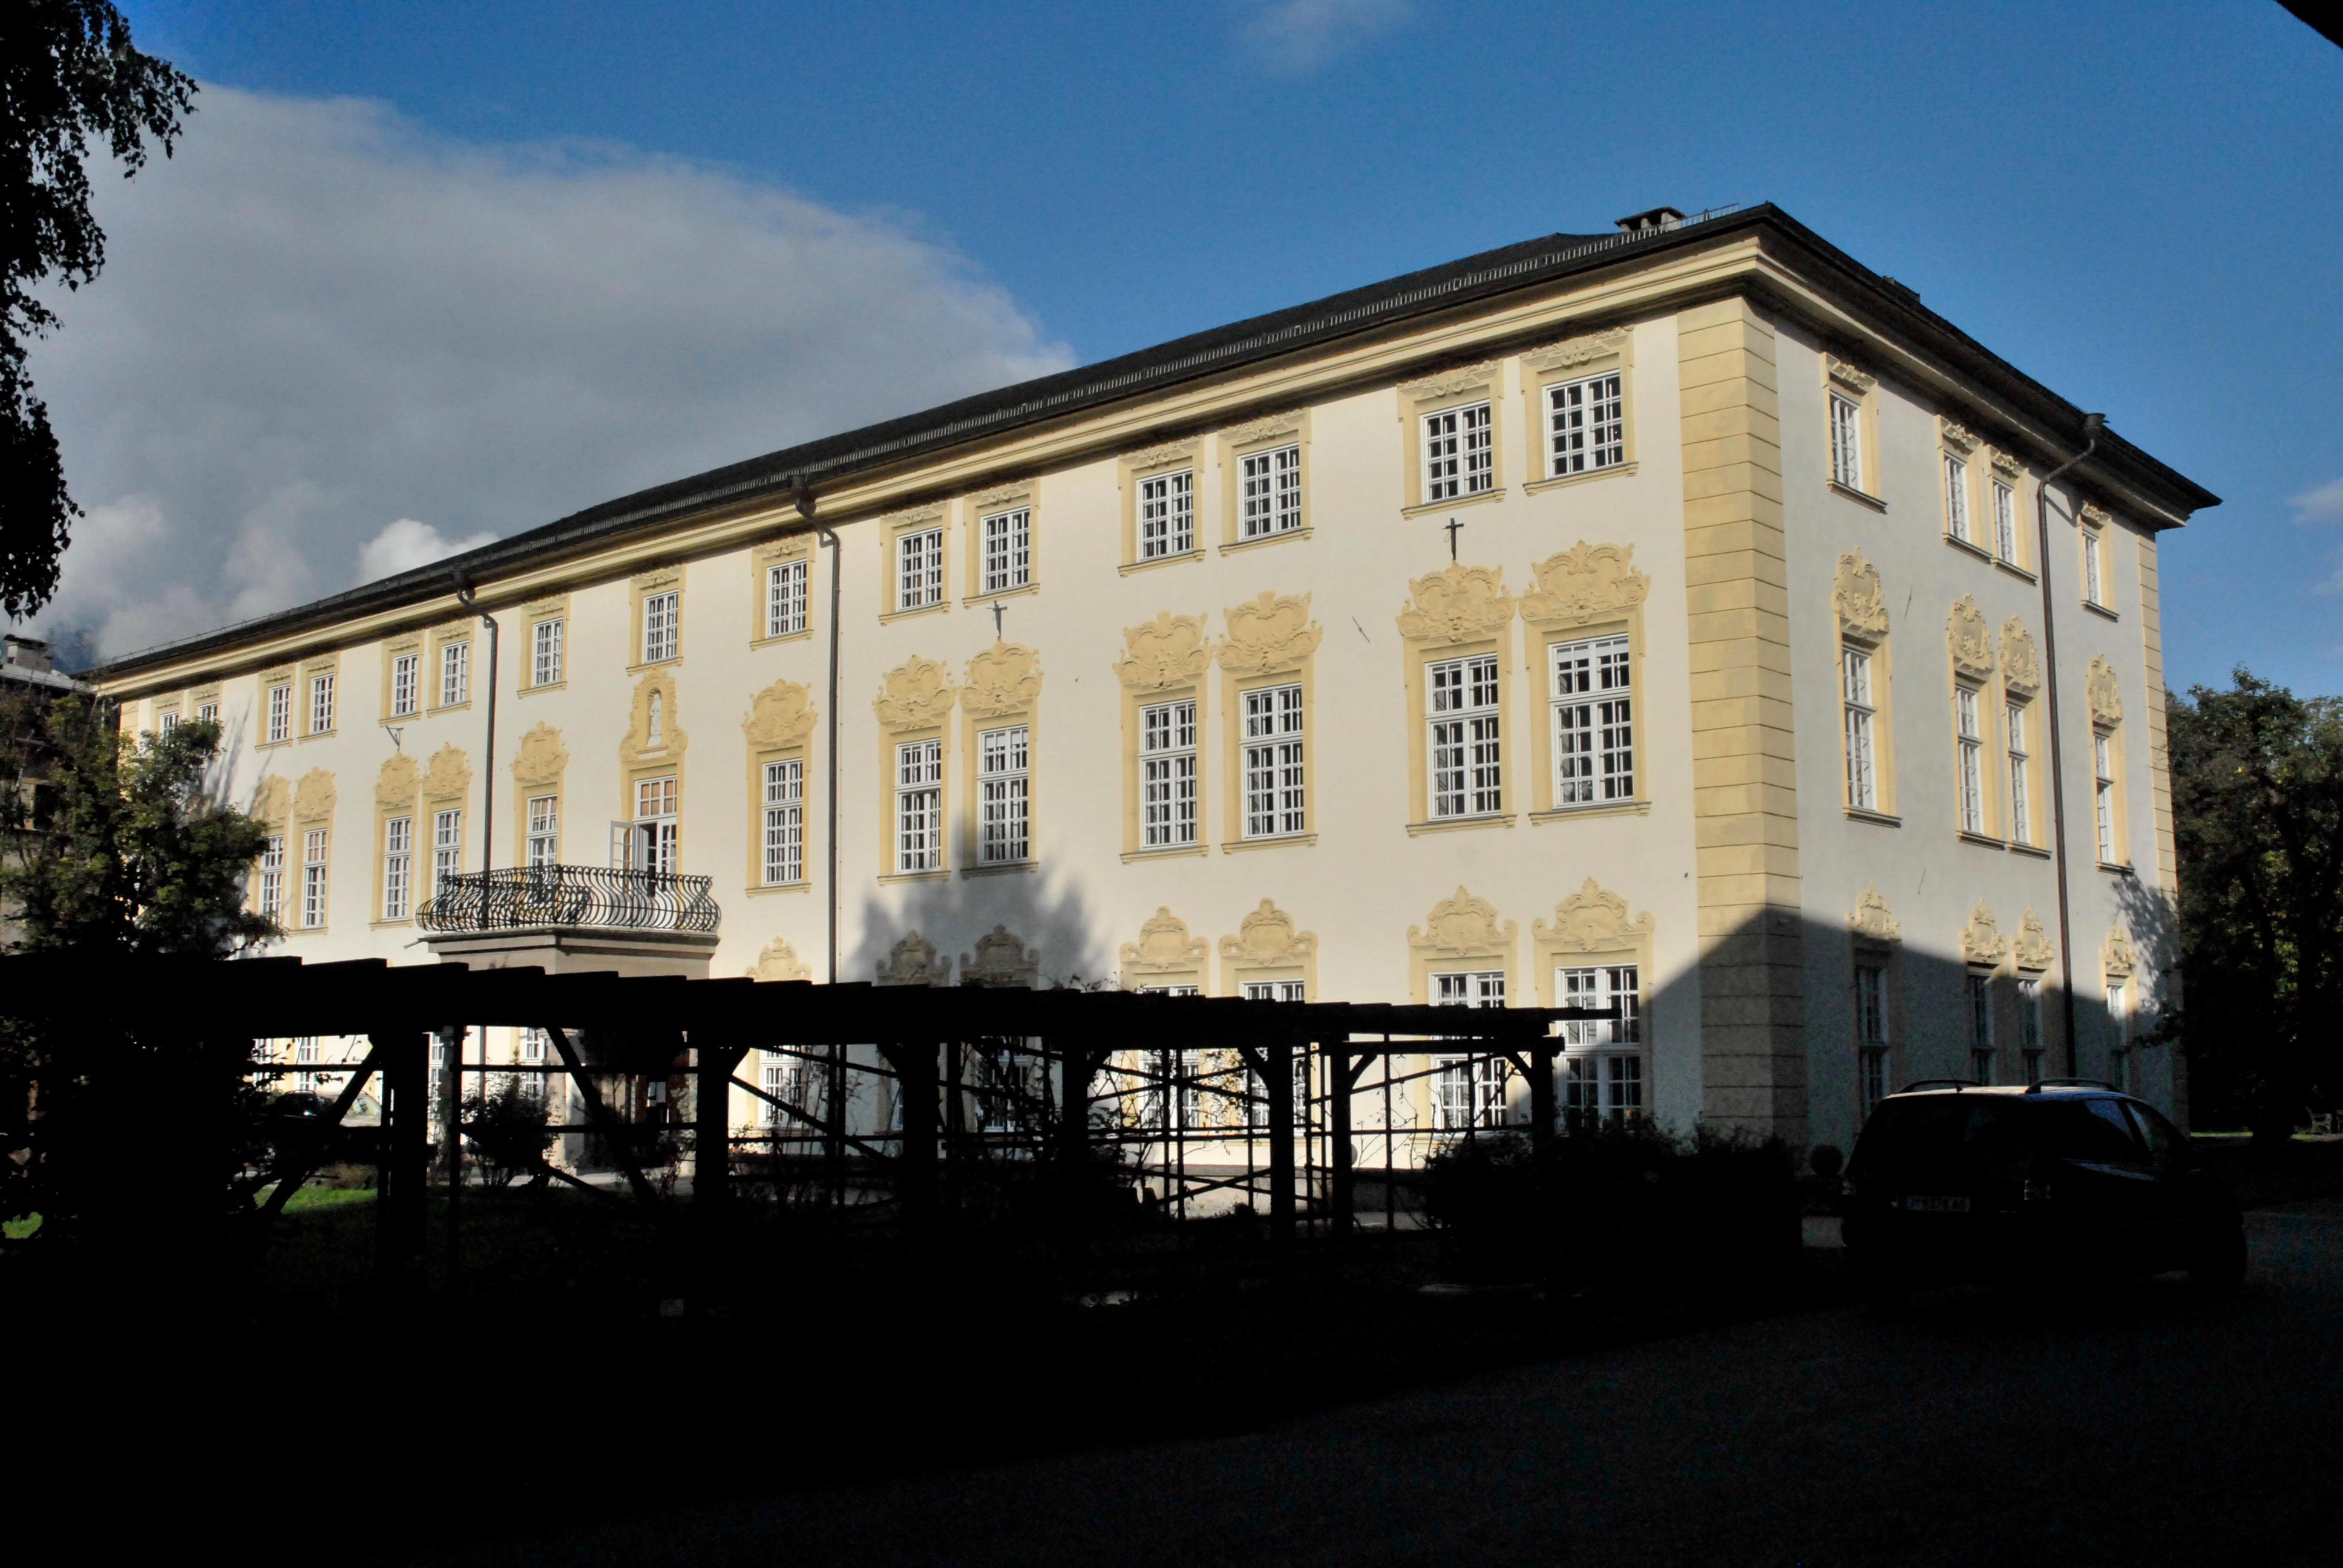 Höhere Bundeslehranstalt - Wirtschaftsferrari u Modeferrari, Fachschule, Aufbaulehrgang